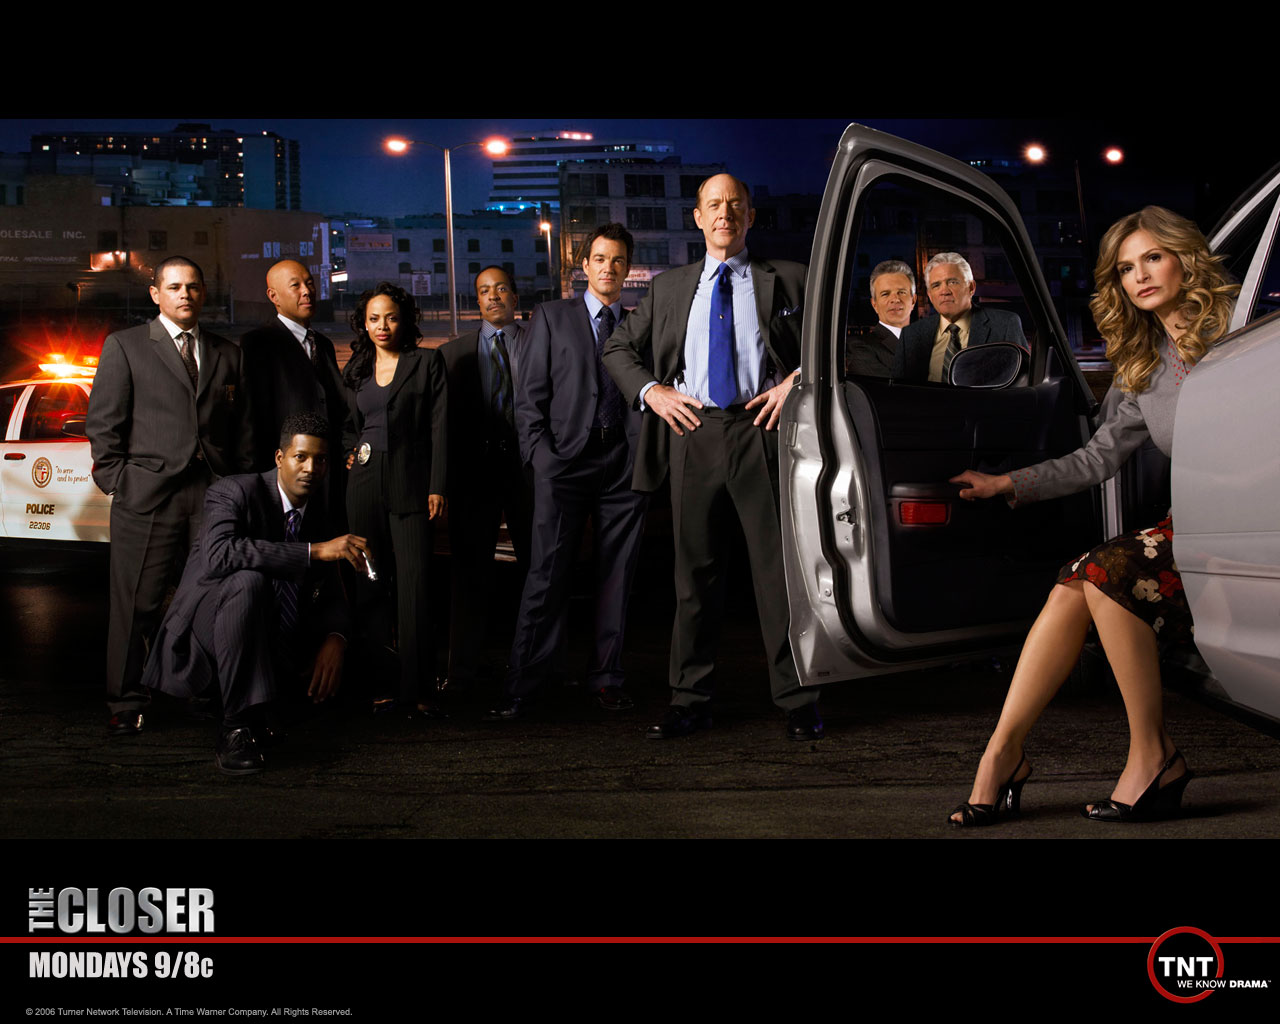 The Closer Cast The Closer Photo 338167 Fanpop